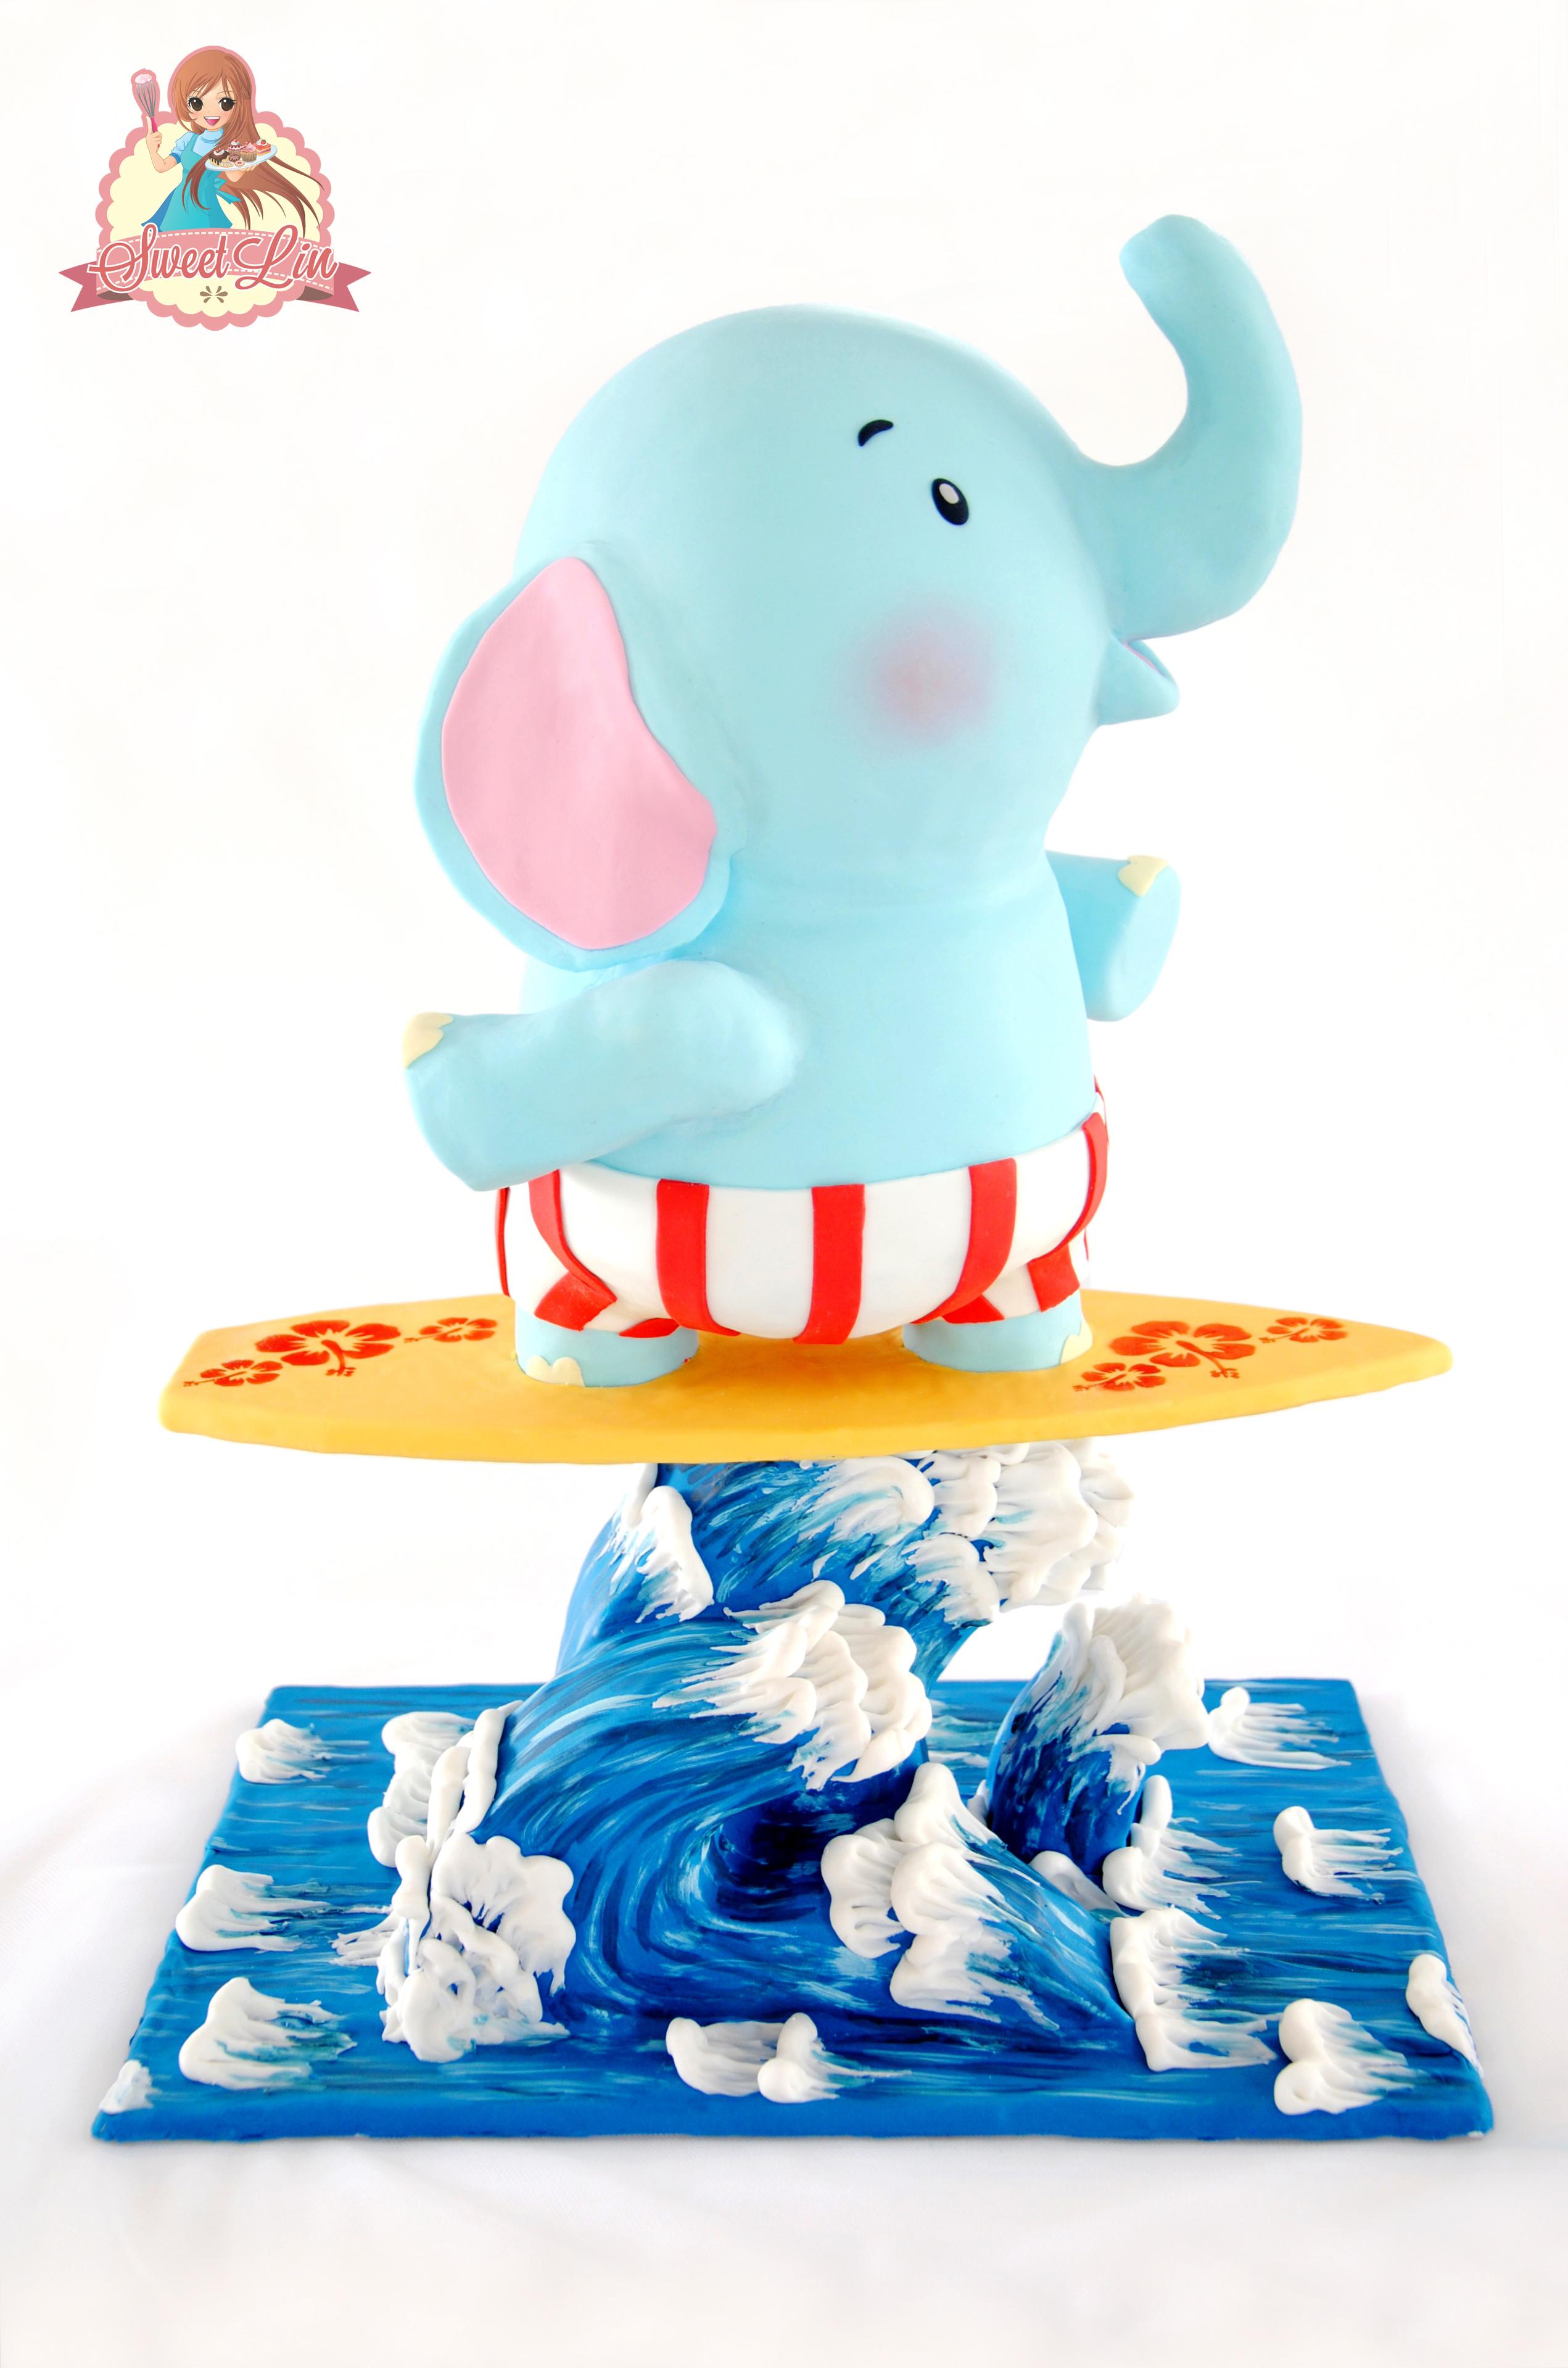 Gravity Defying Surfing Elephant